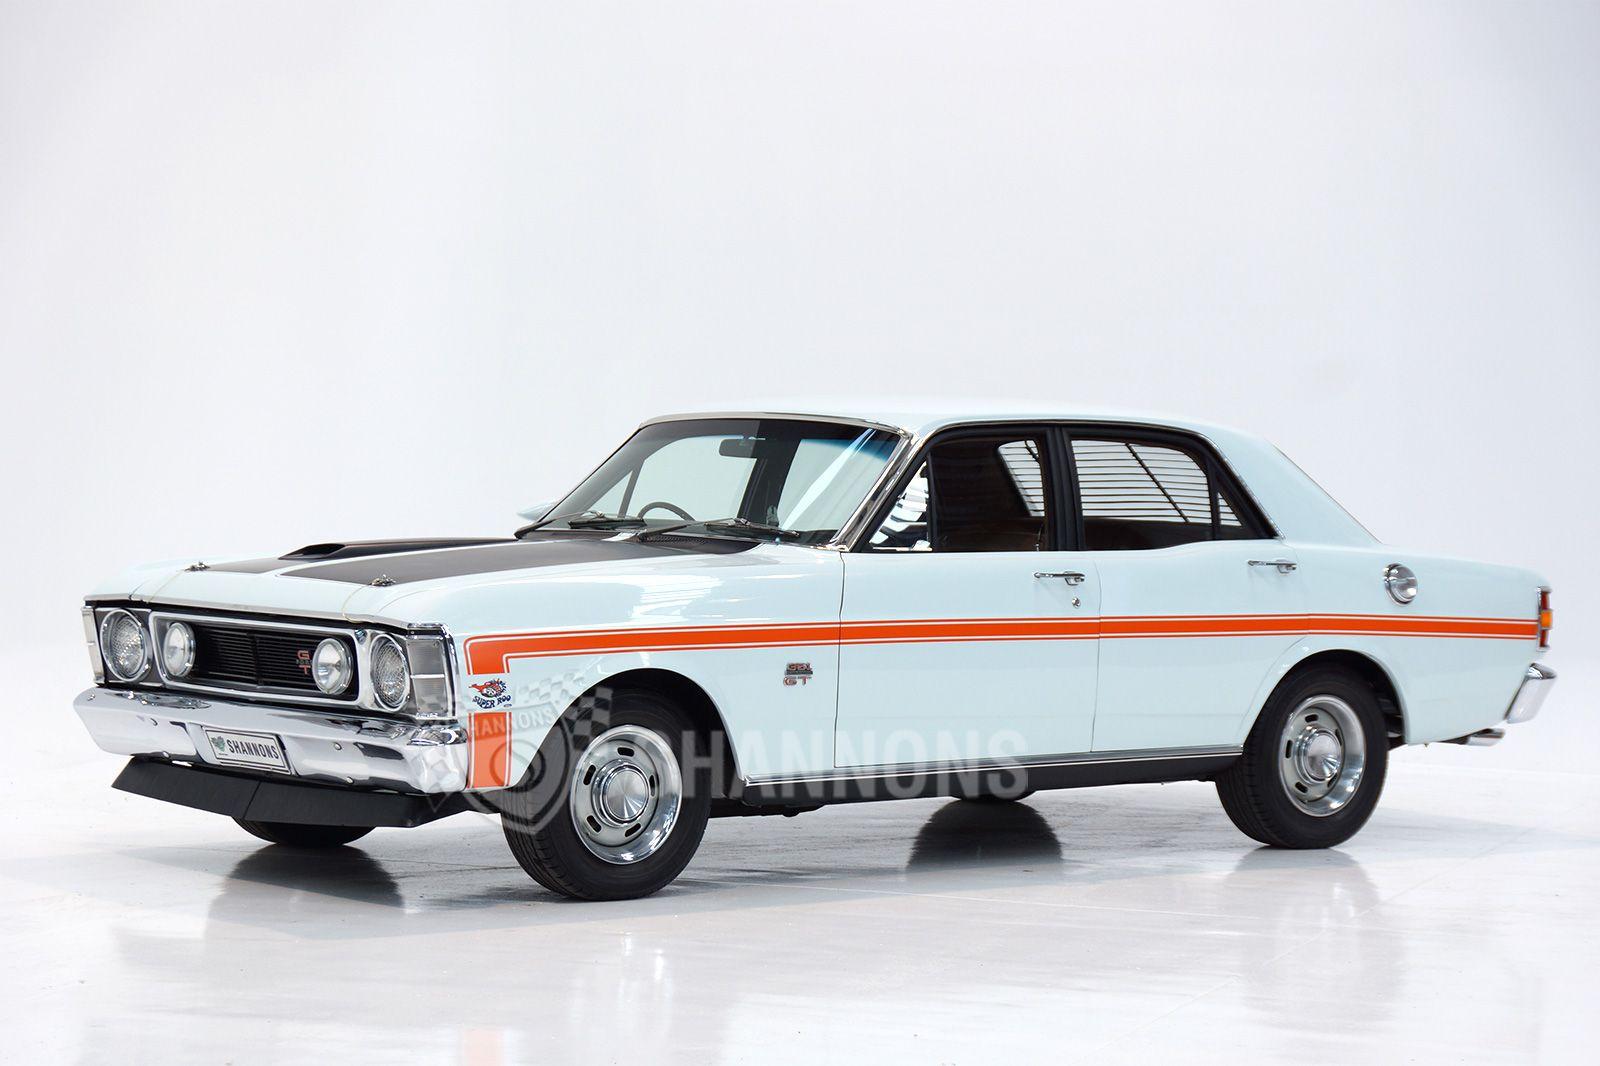 1970 Ford XW Falcon GTHO Phase II